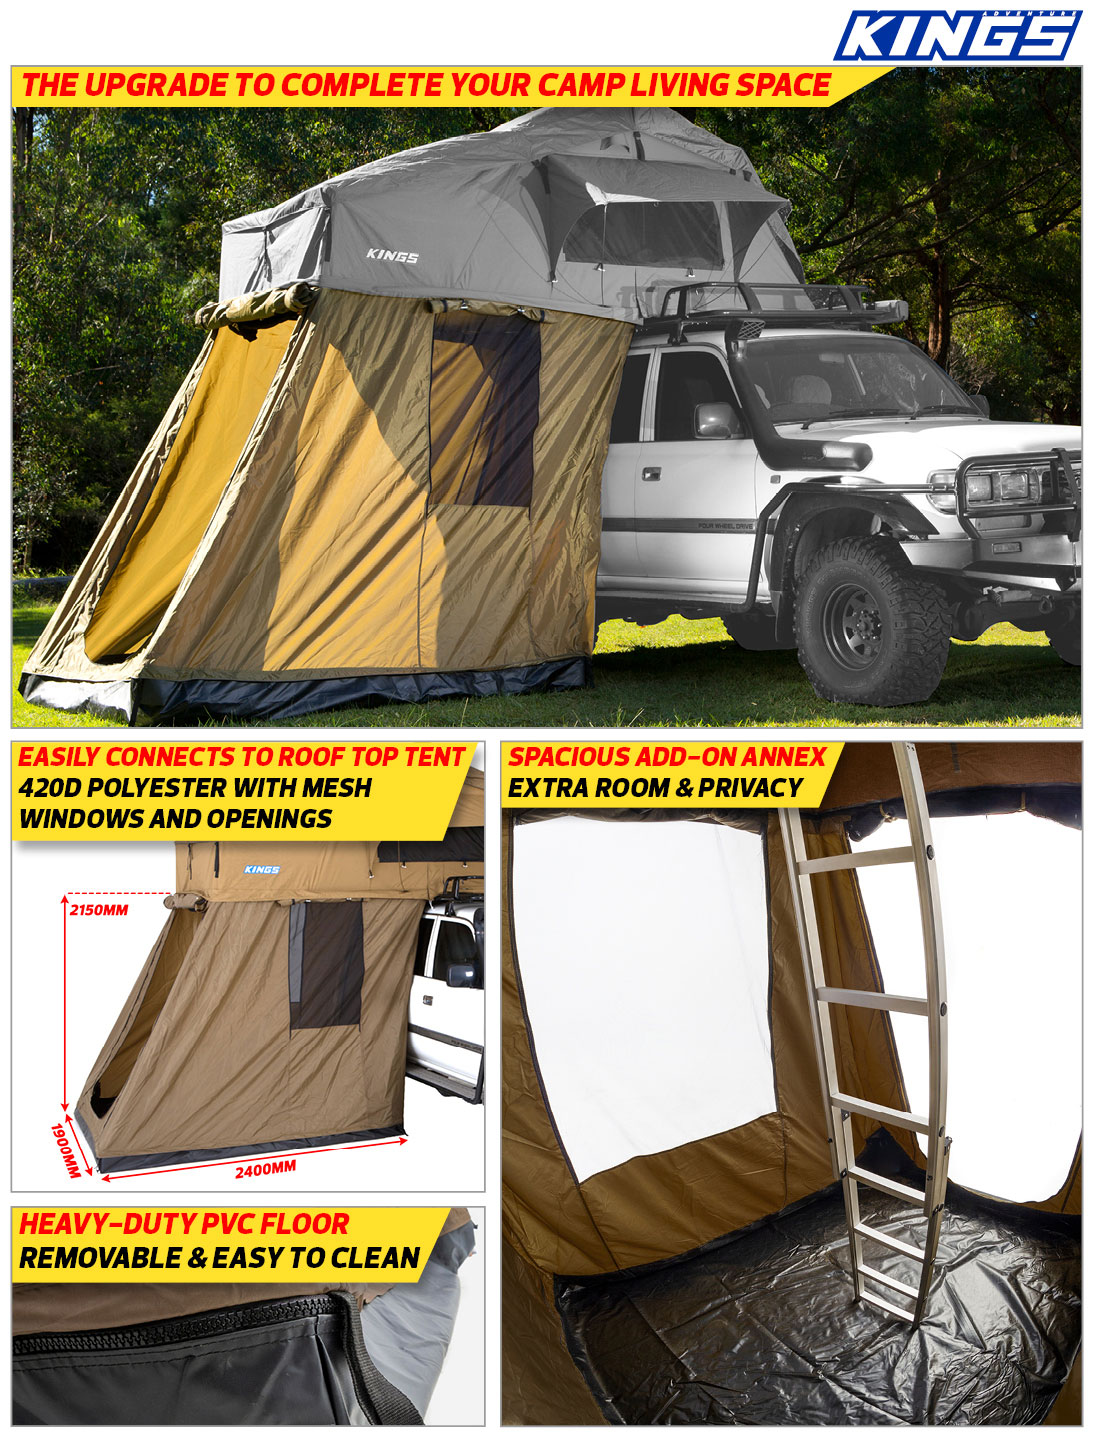 Adventure Kings Roof Top Tent 4-man annex for roof top tent, fully waterproof   incl enclosed floor    adventure kings